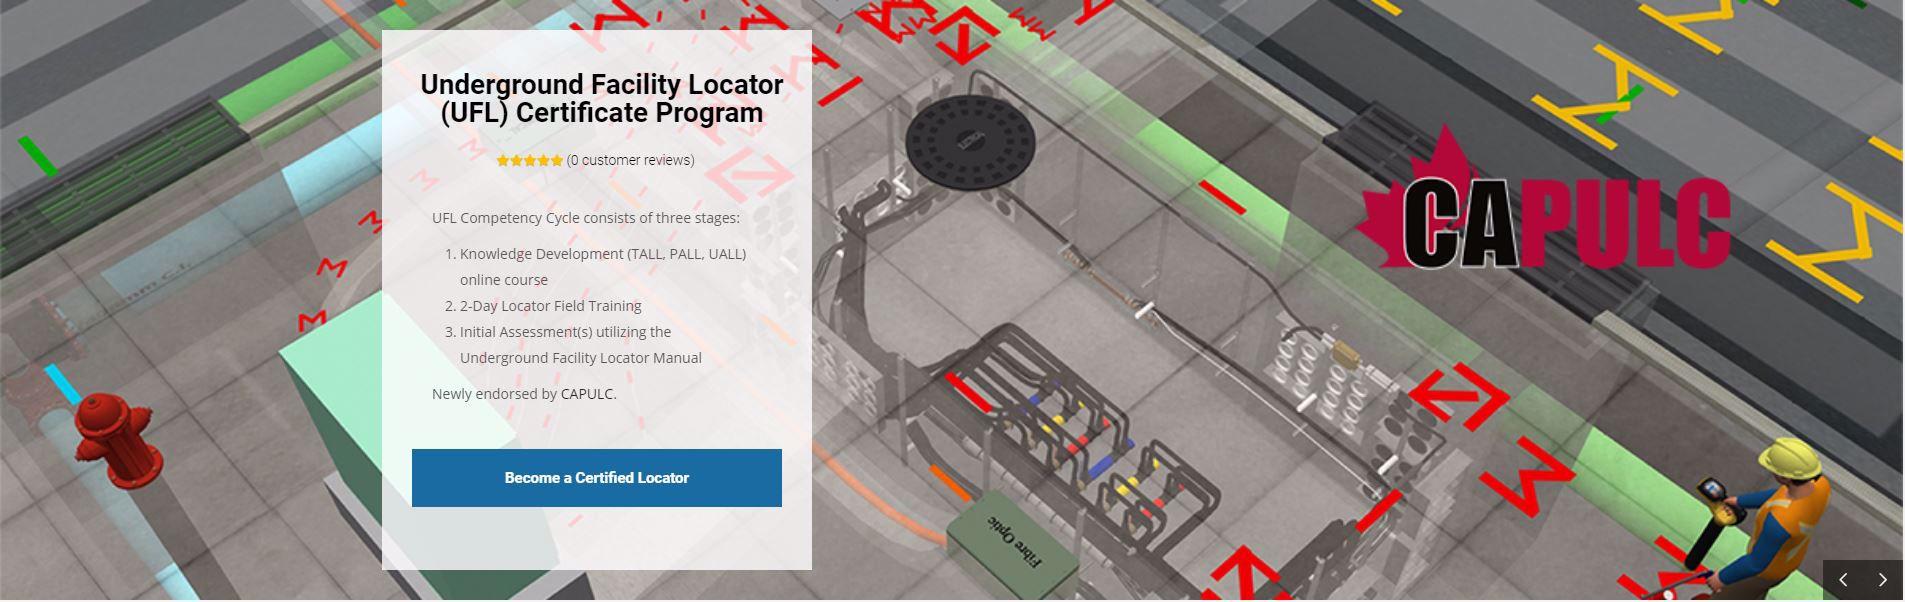 Underground Facility Locator (UFL) Certificate Program